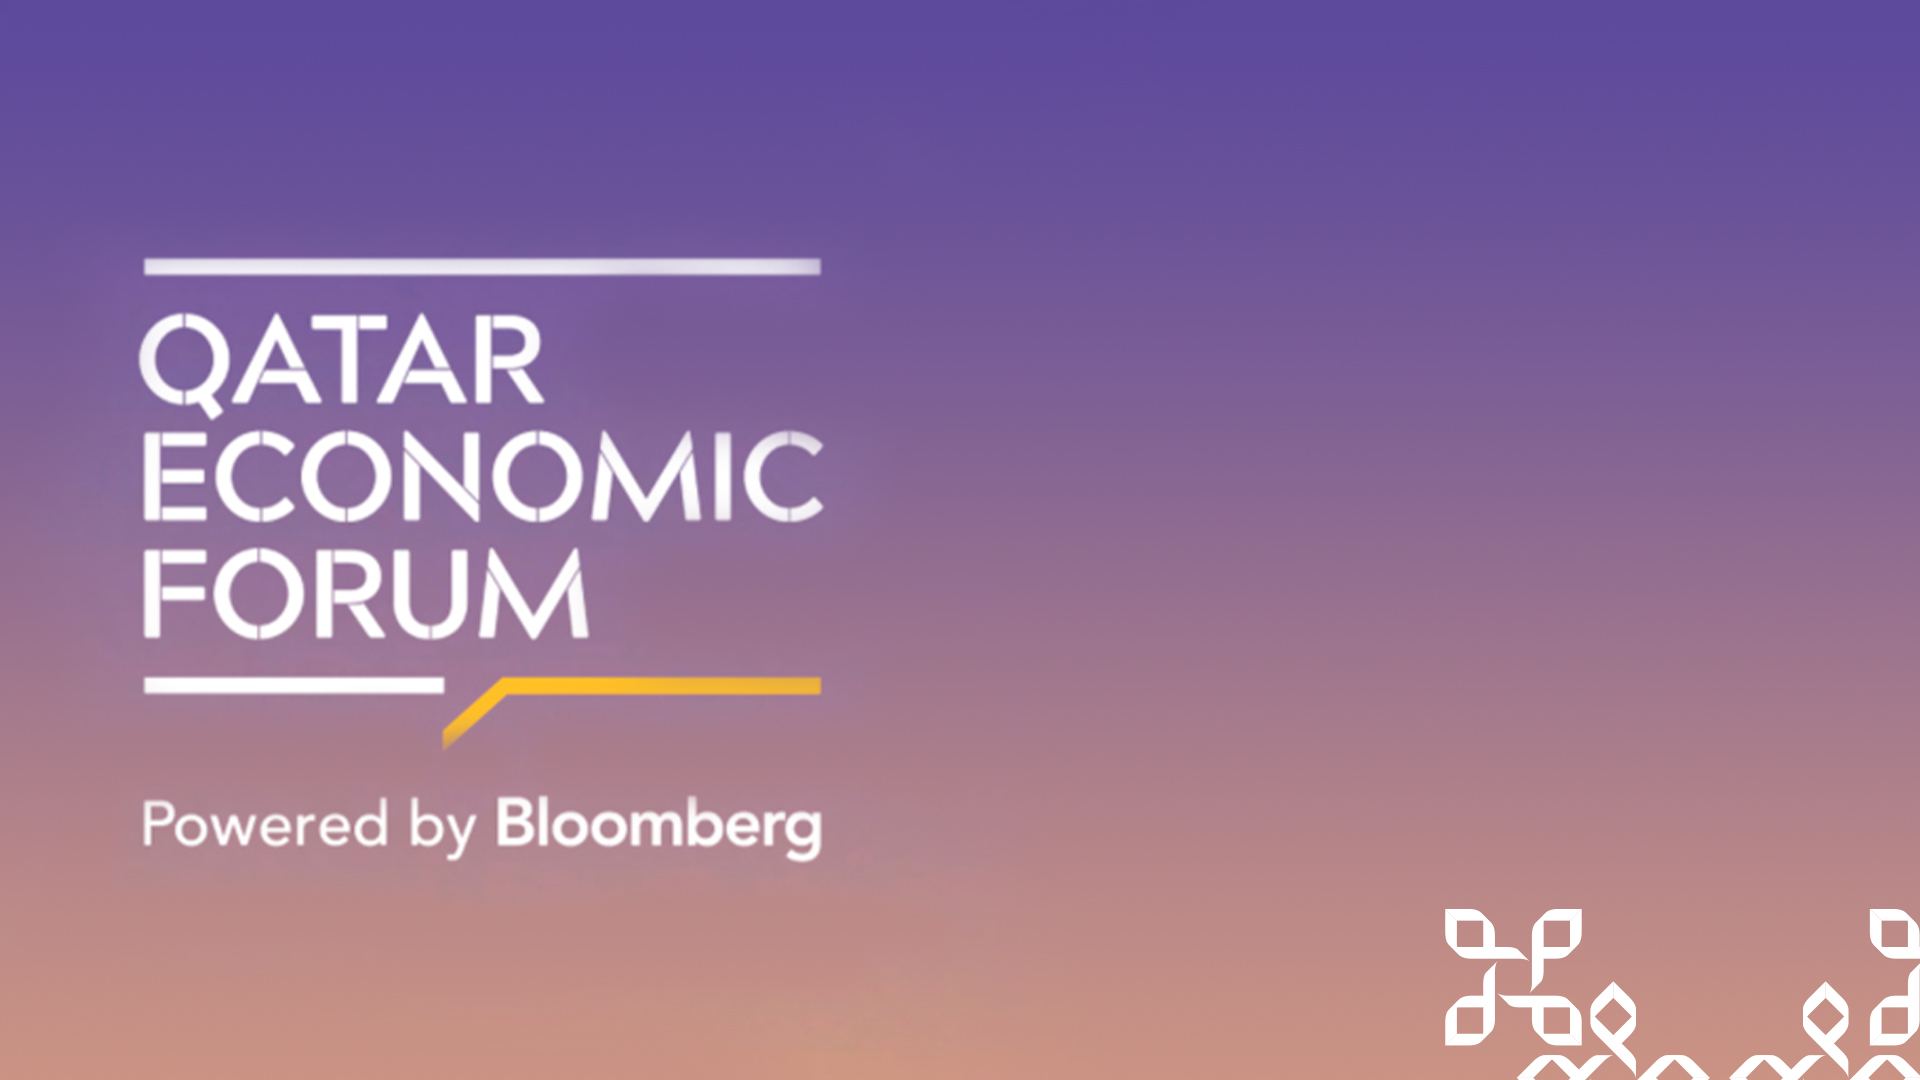 Qatar Economic Forum Powered by Bloomberg